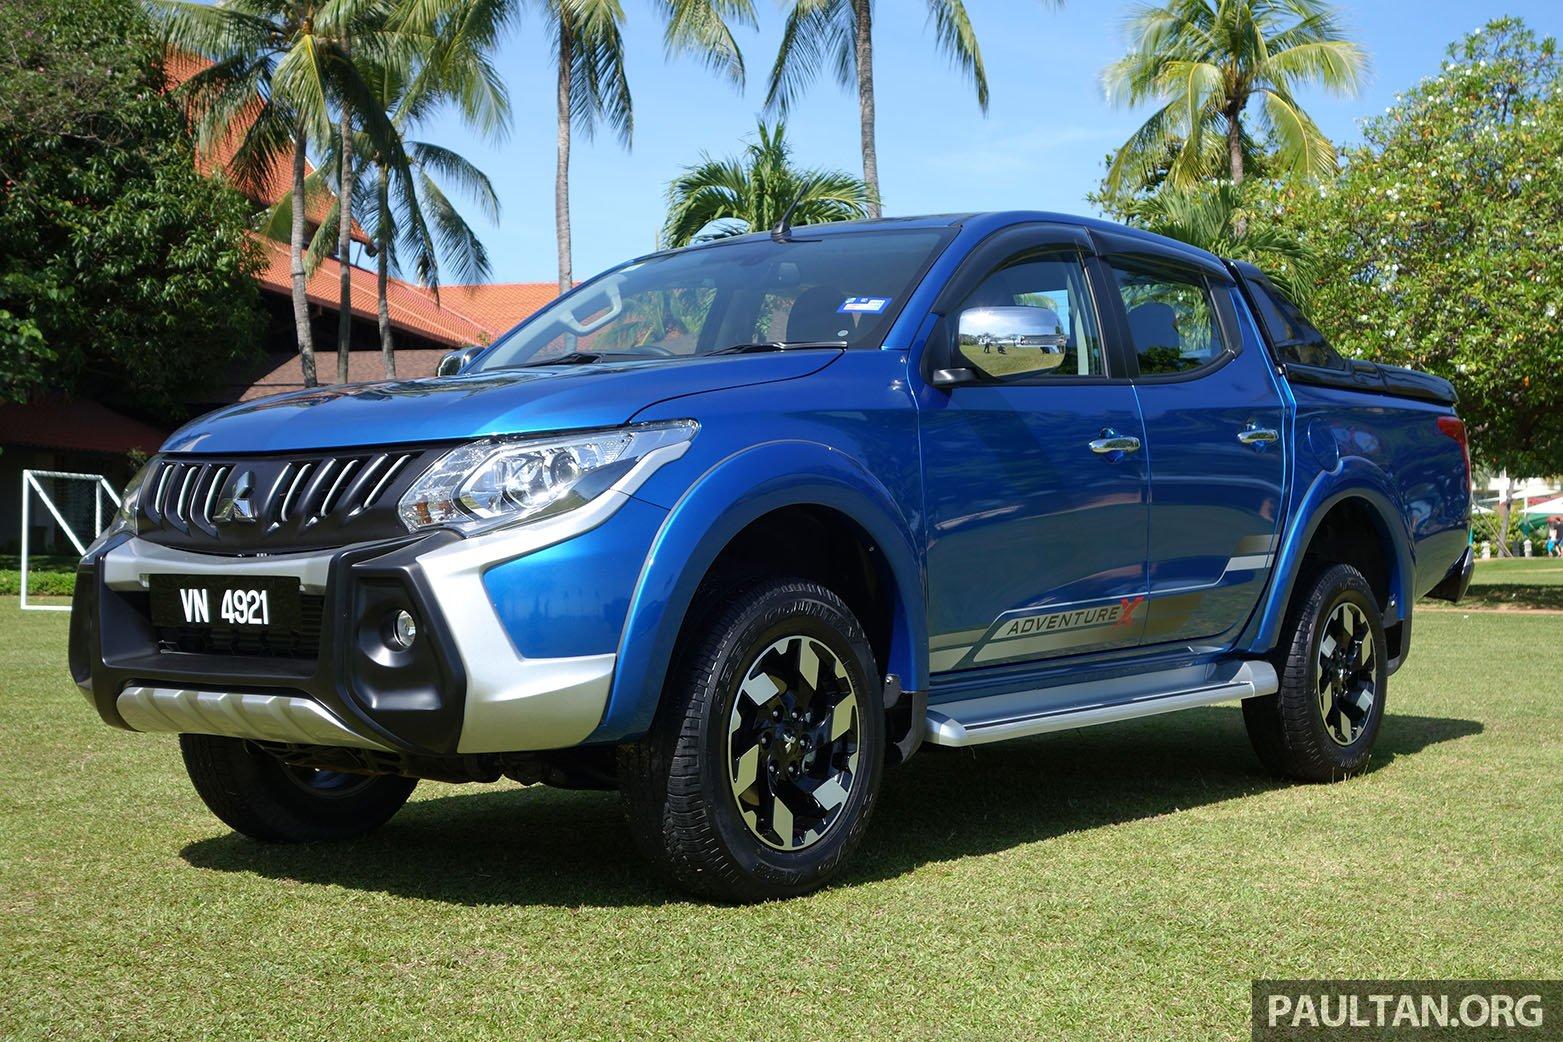 Driven 2017 Mitsubishi Triton Vgt Malaysia Review